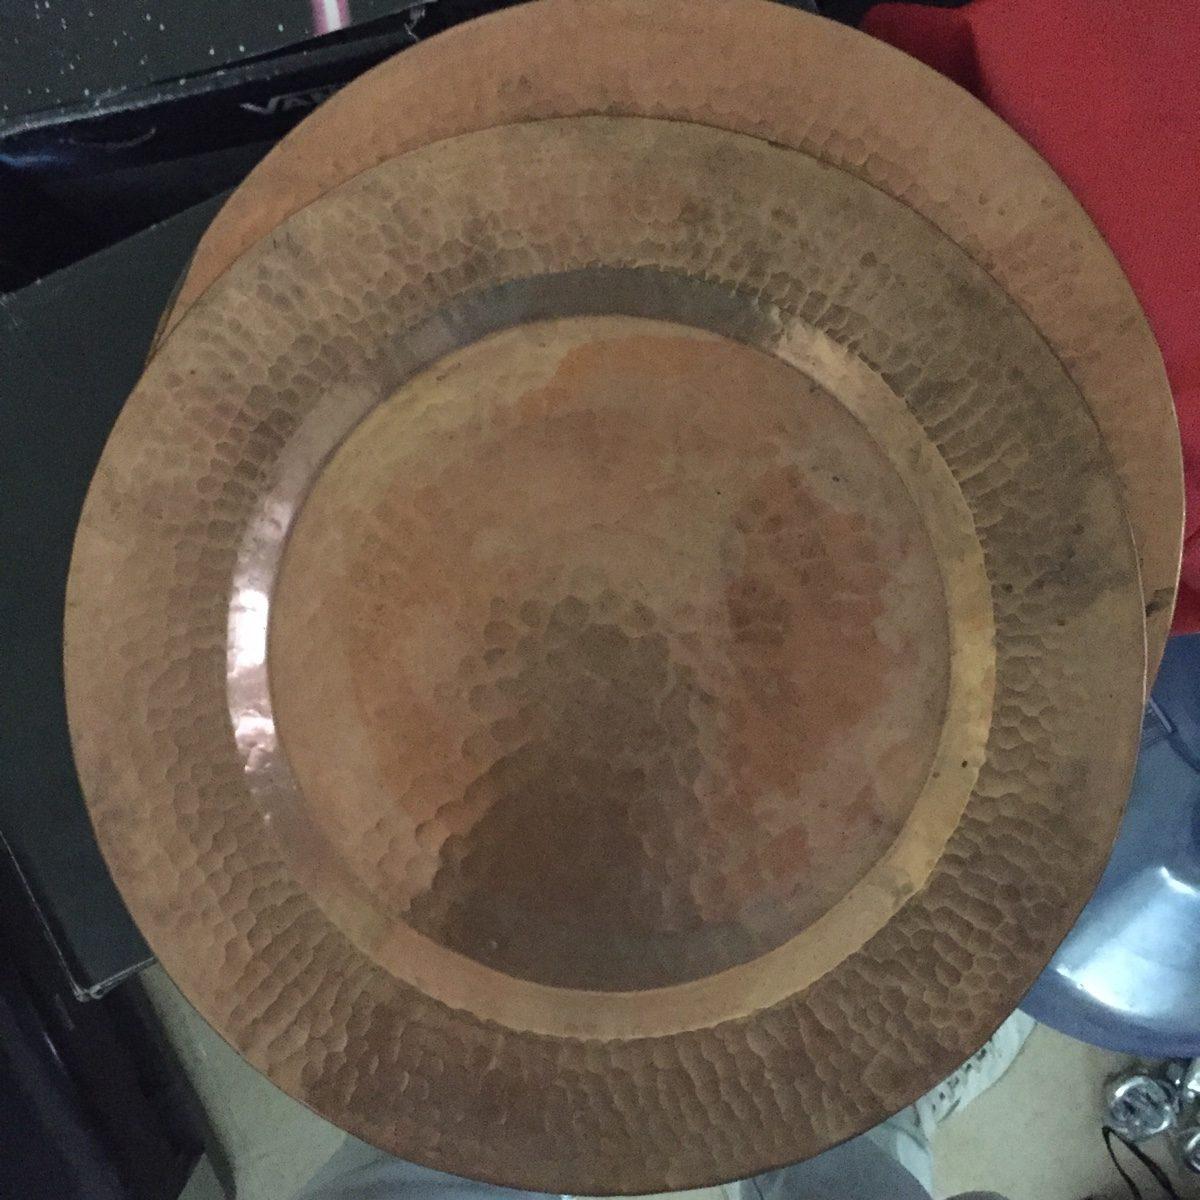 Plato de cobre en mercado libre for Articulos de decoracion de cobre